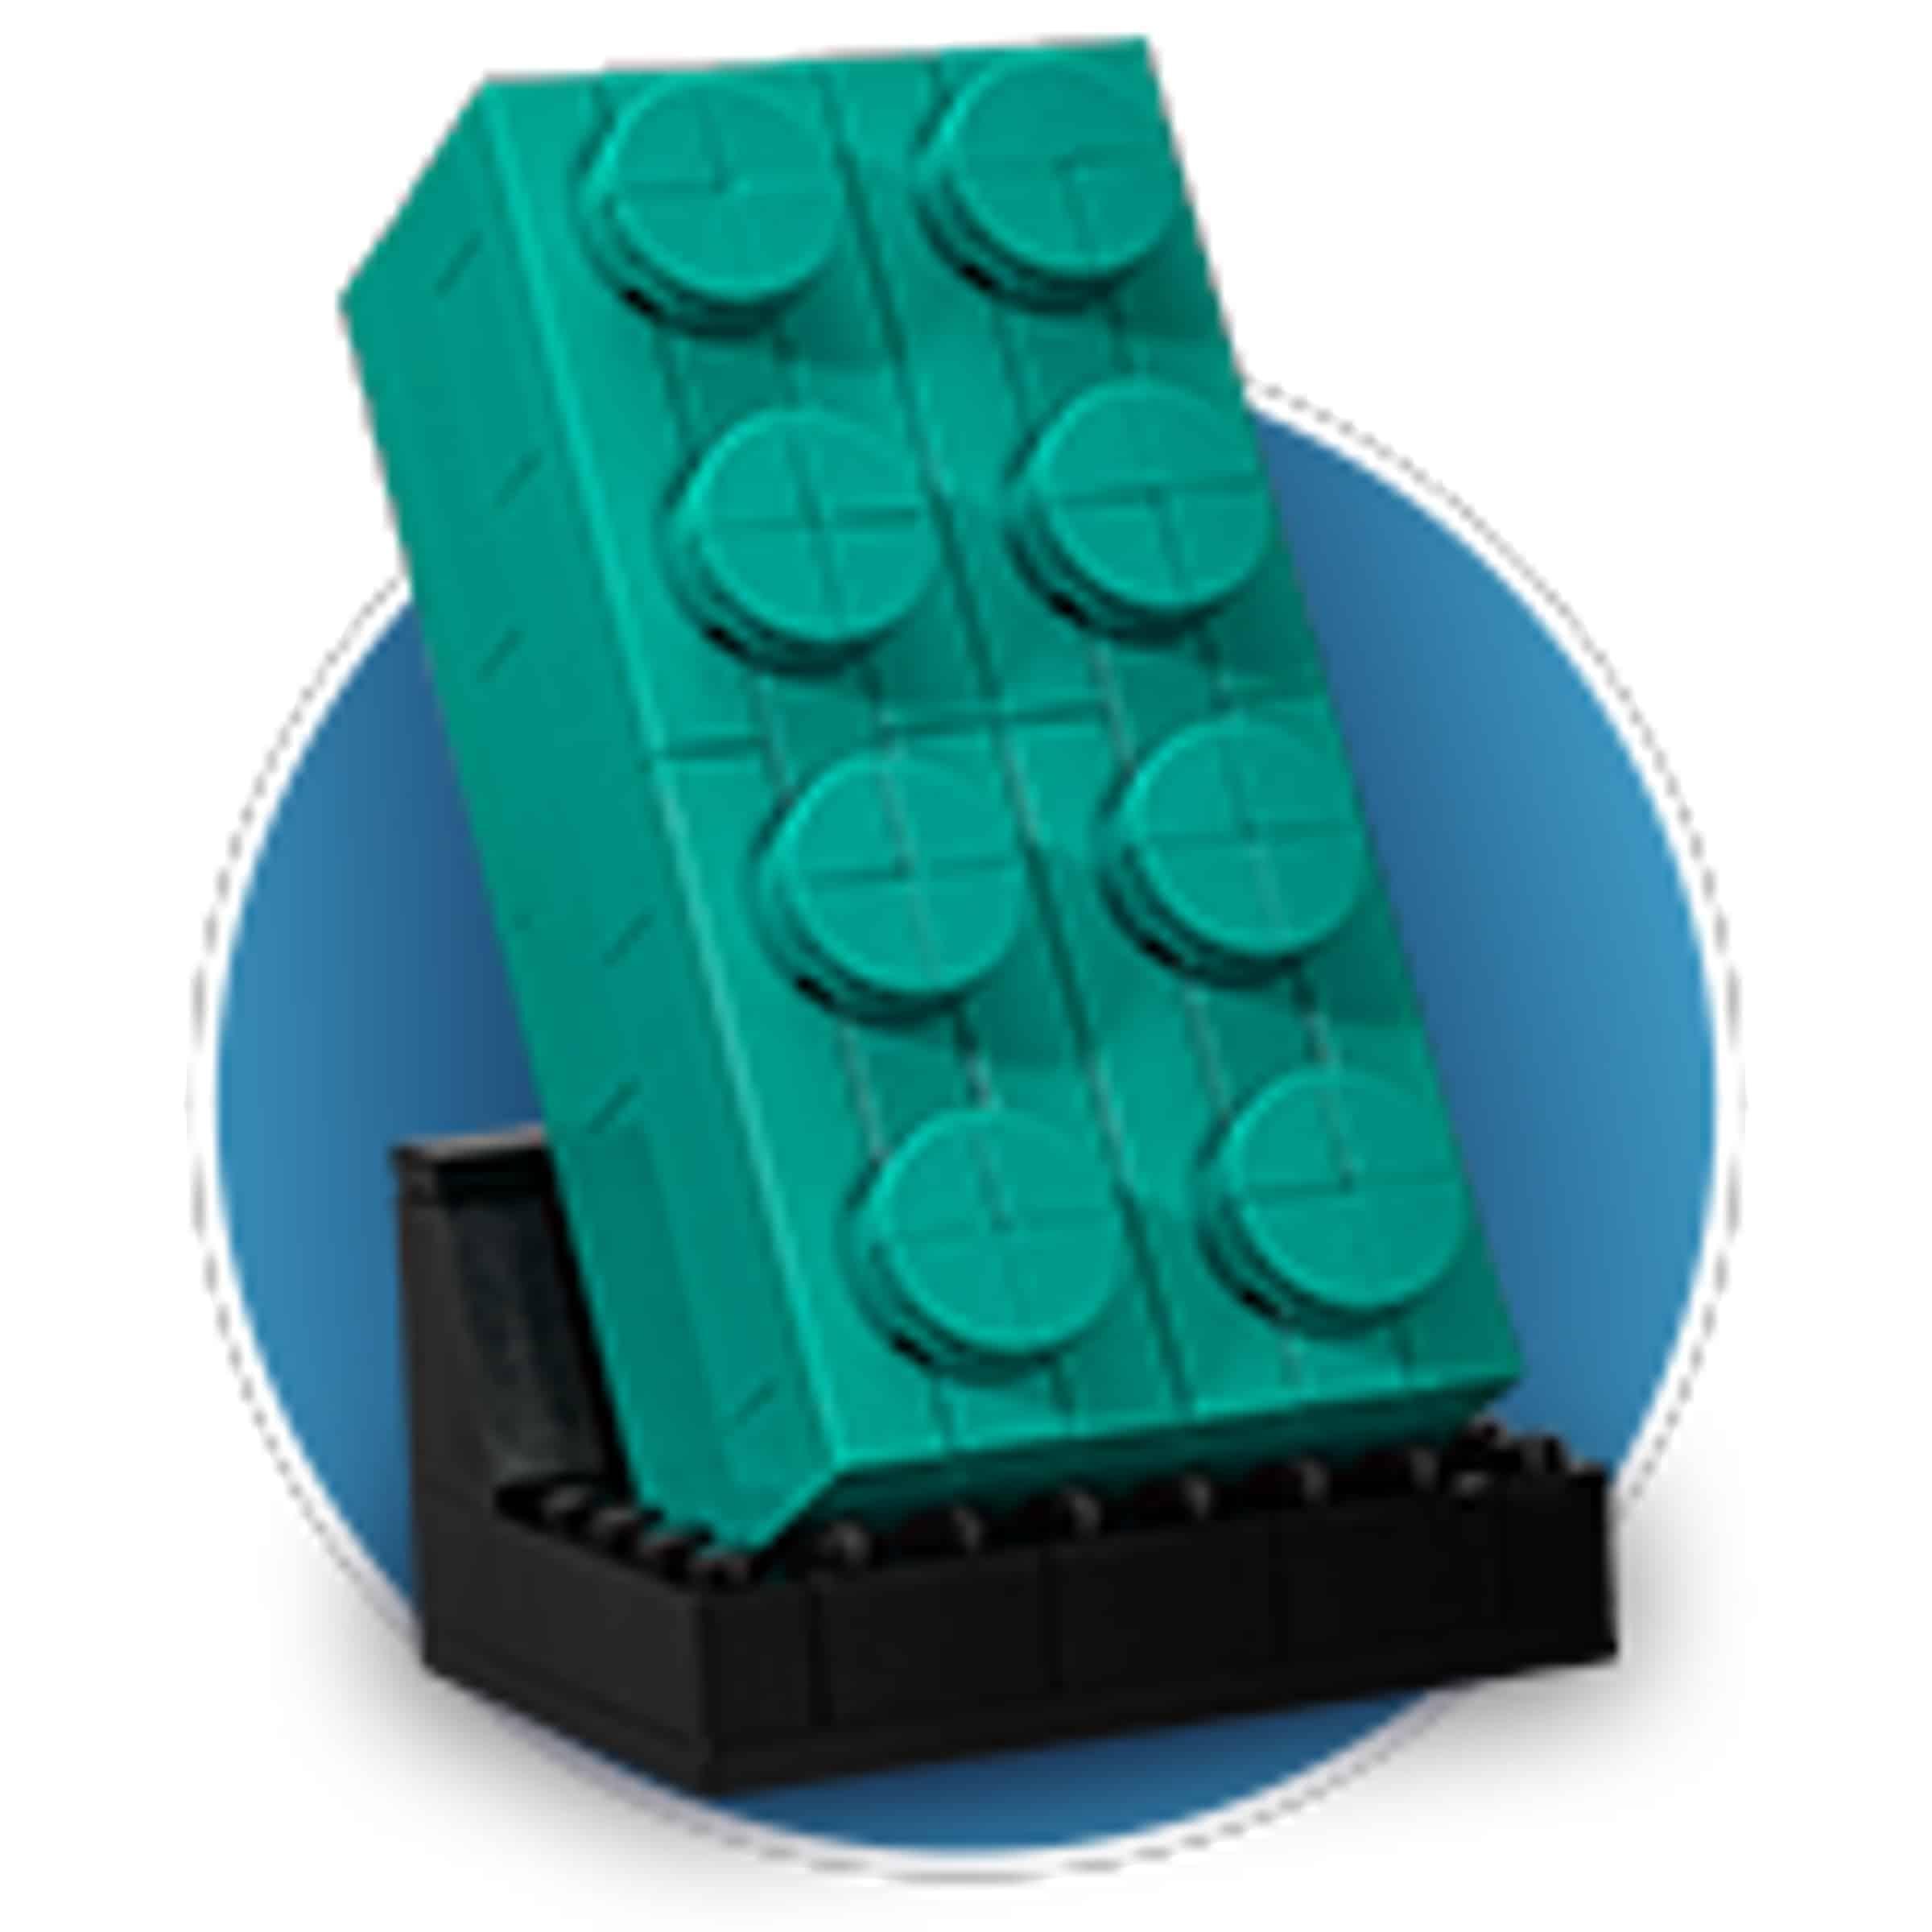 lego 5006291 2x4 teal brick